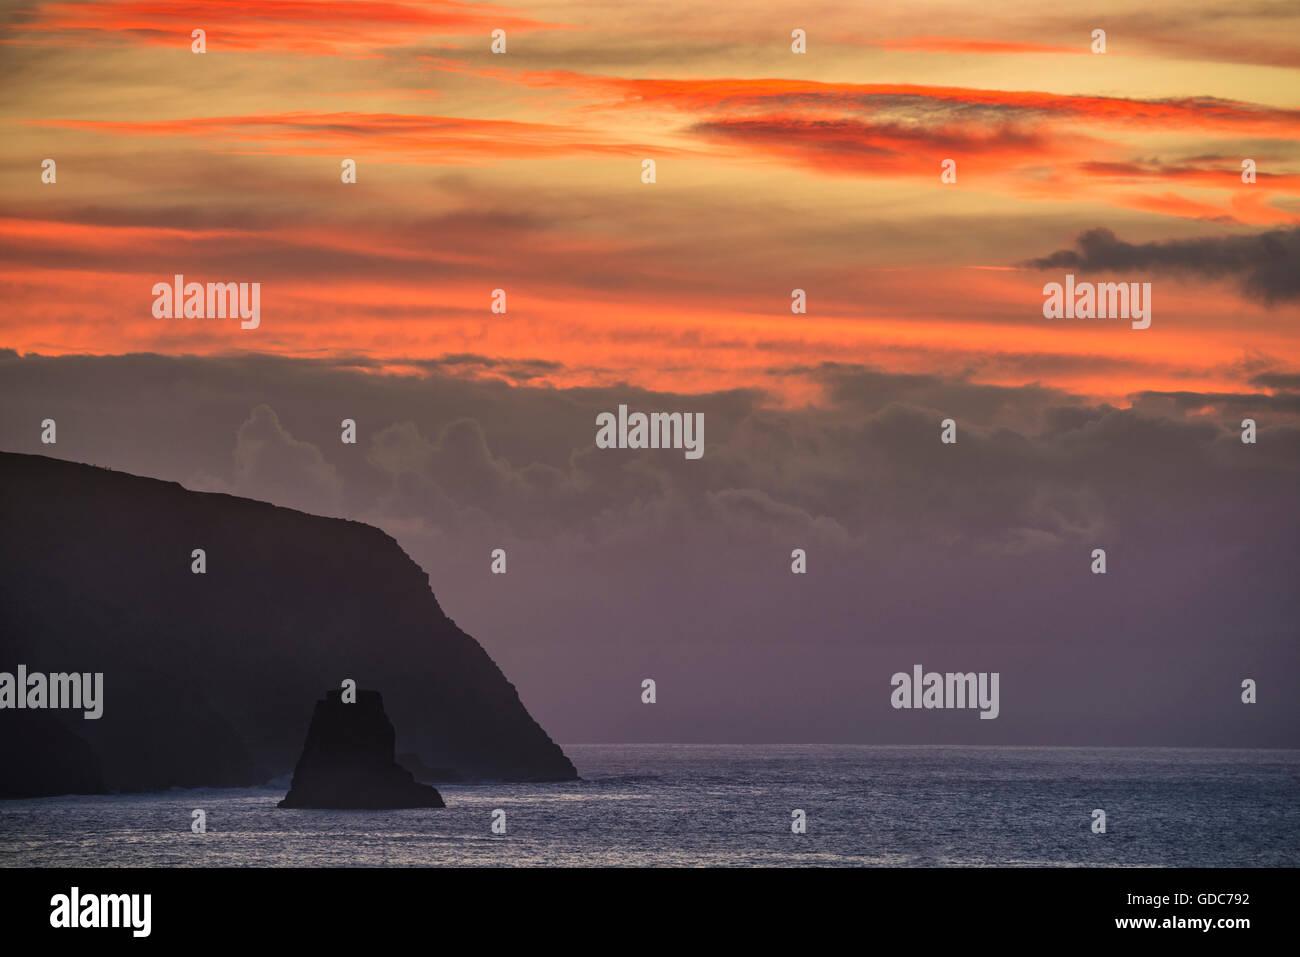 Südamerika, Chile, Osterinsel, Isla de Pasqua, Südpazifik, UNESCO, Welterbe, Sonnenaufgang Stockbild